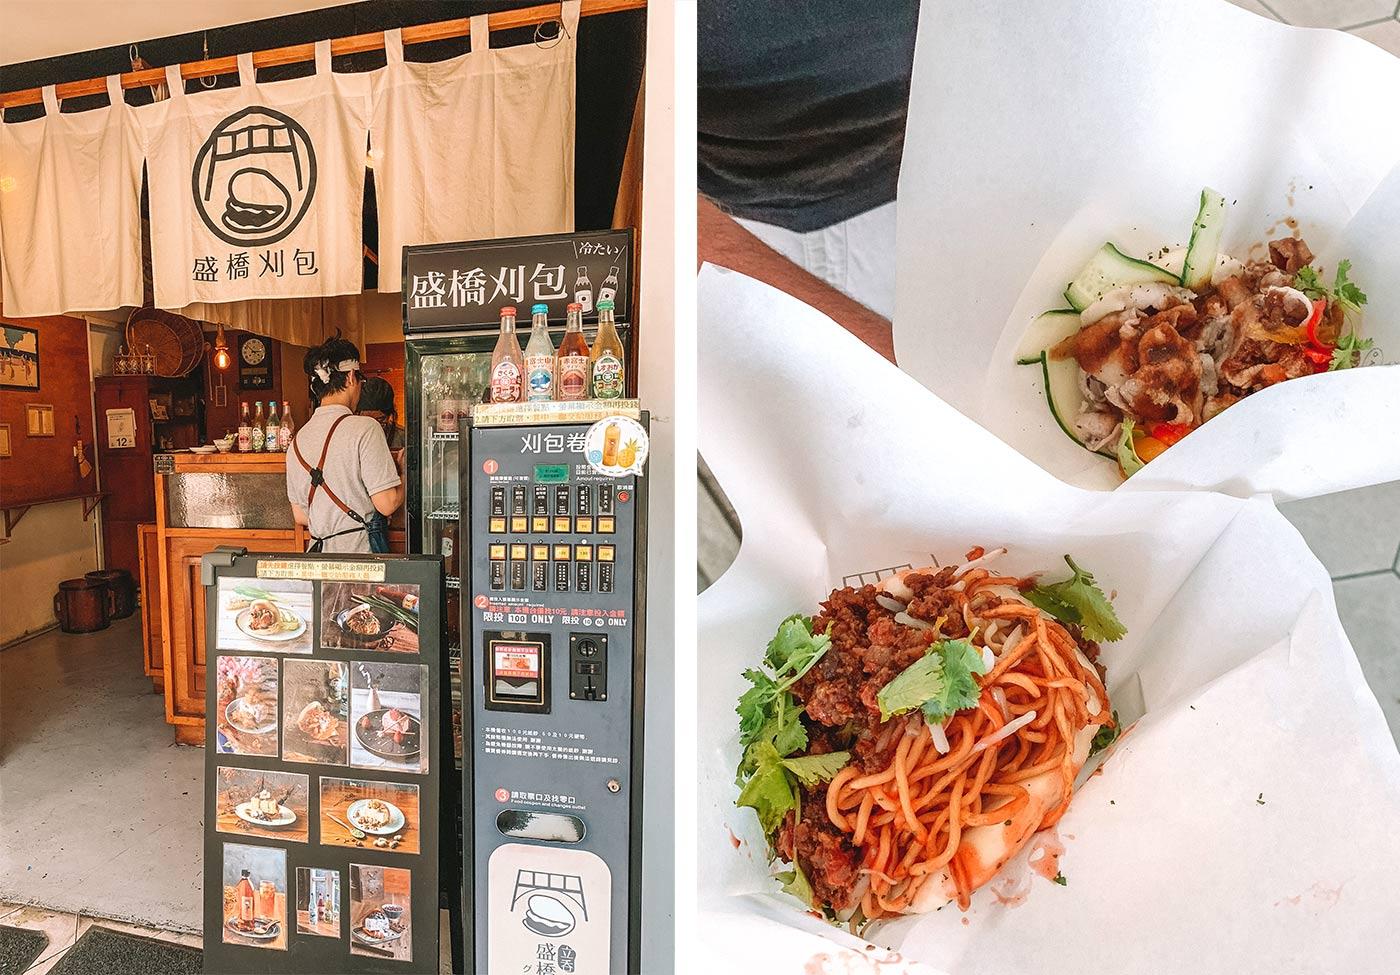 Things to do in Taichung, Taiwan blog post bashibao steamed bao buns